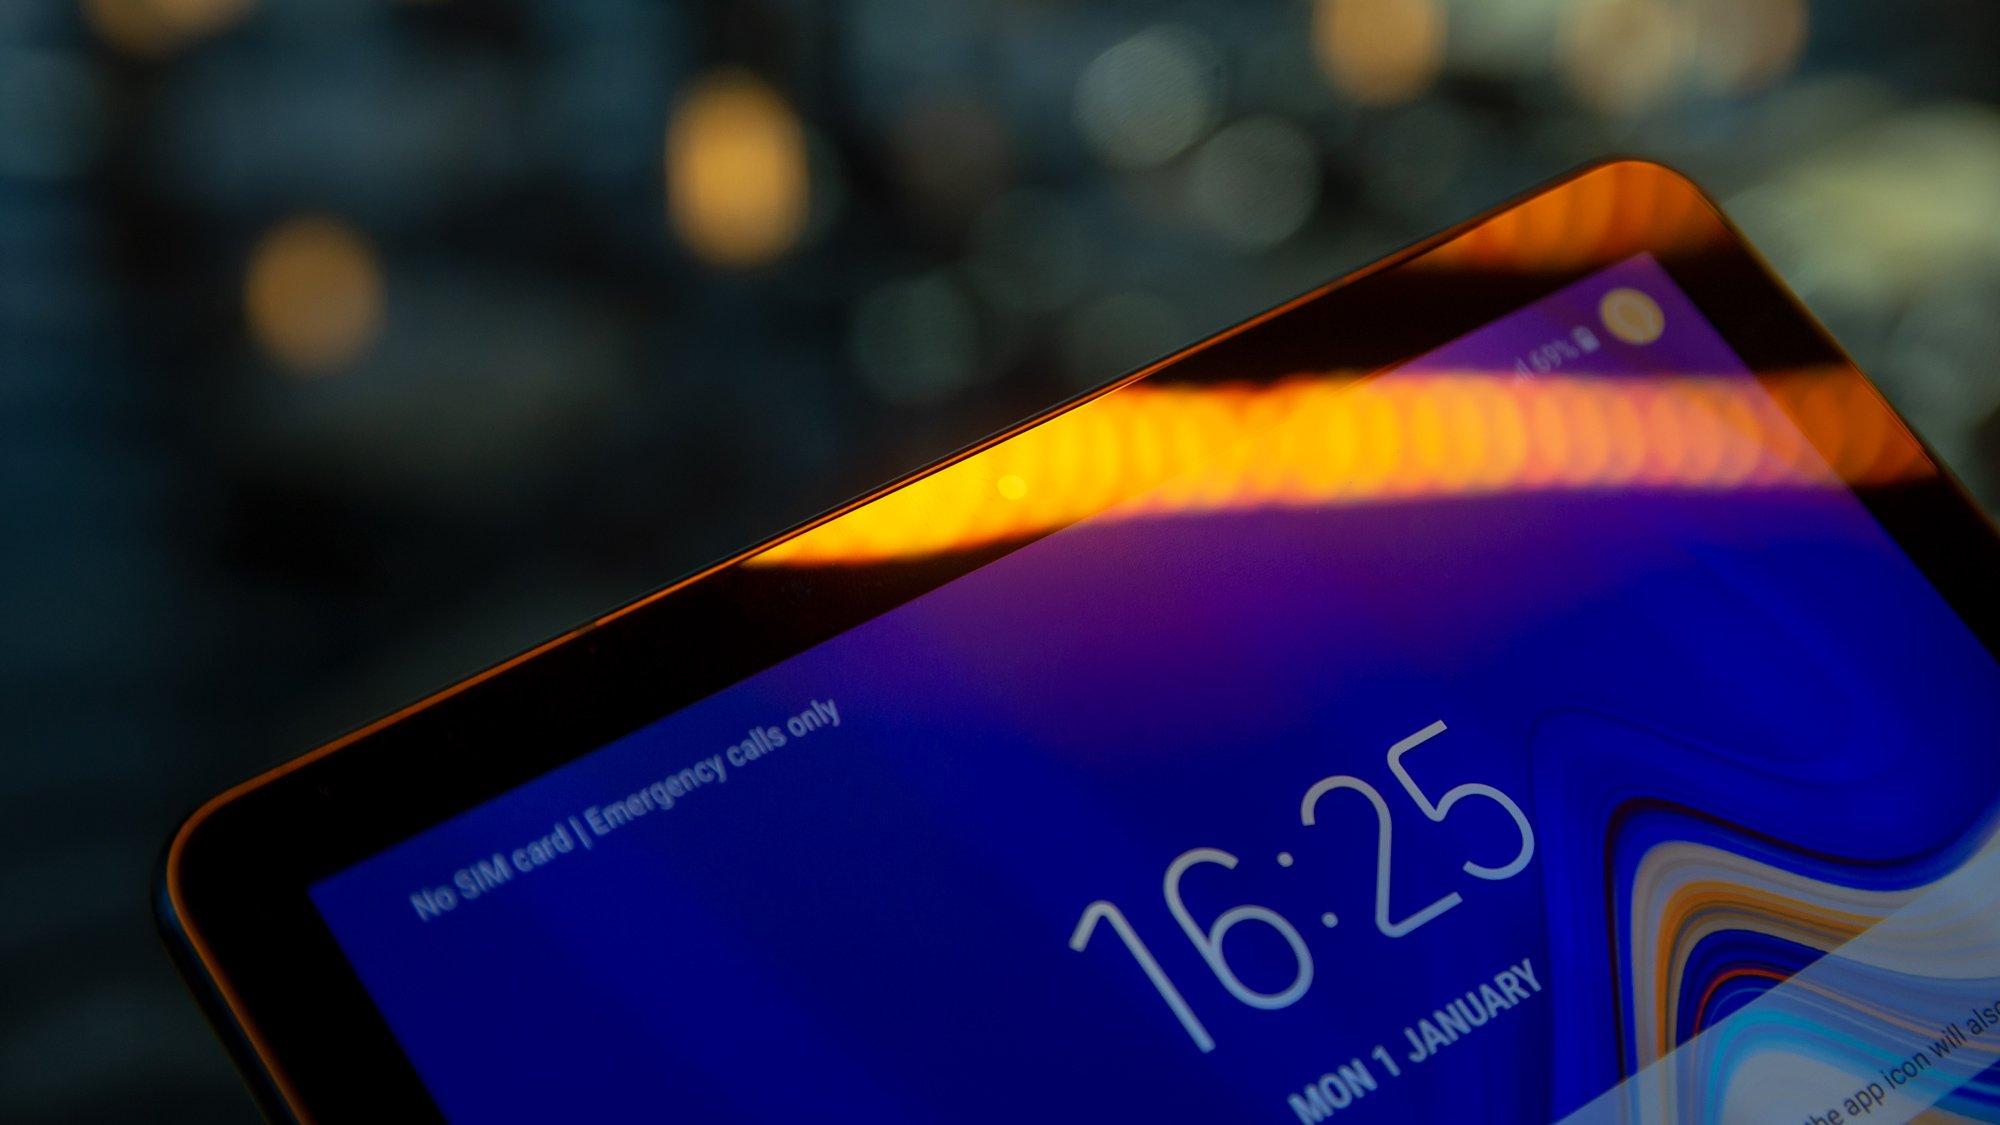 Seven ways the Samsung Galaxy Tab S4 beats the iPad Pro